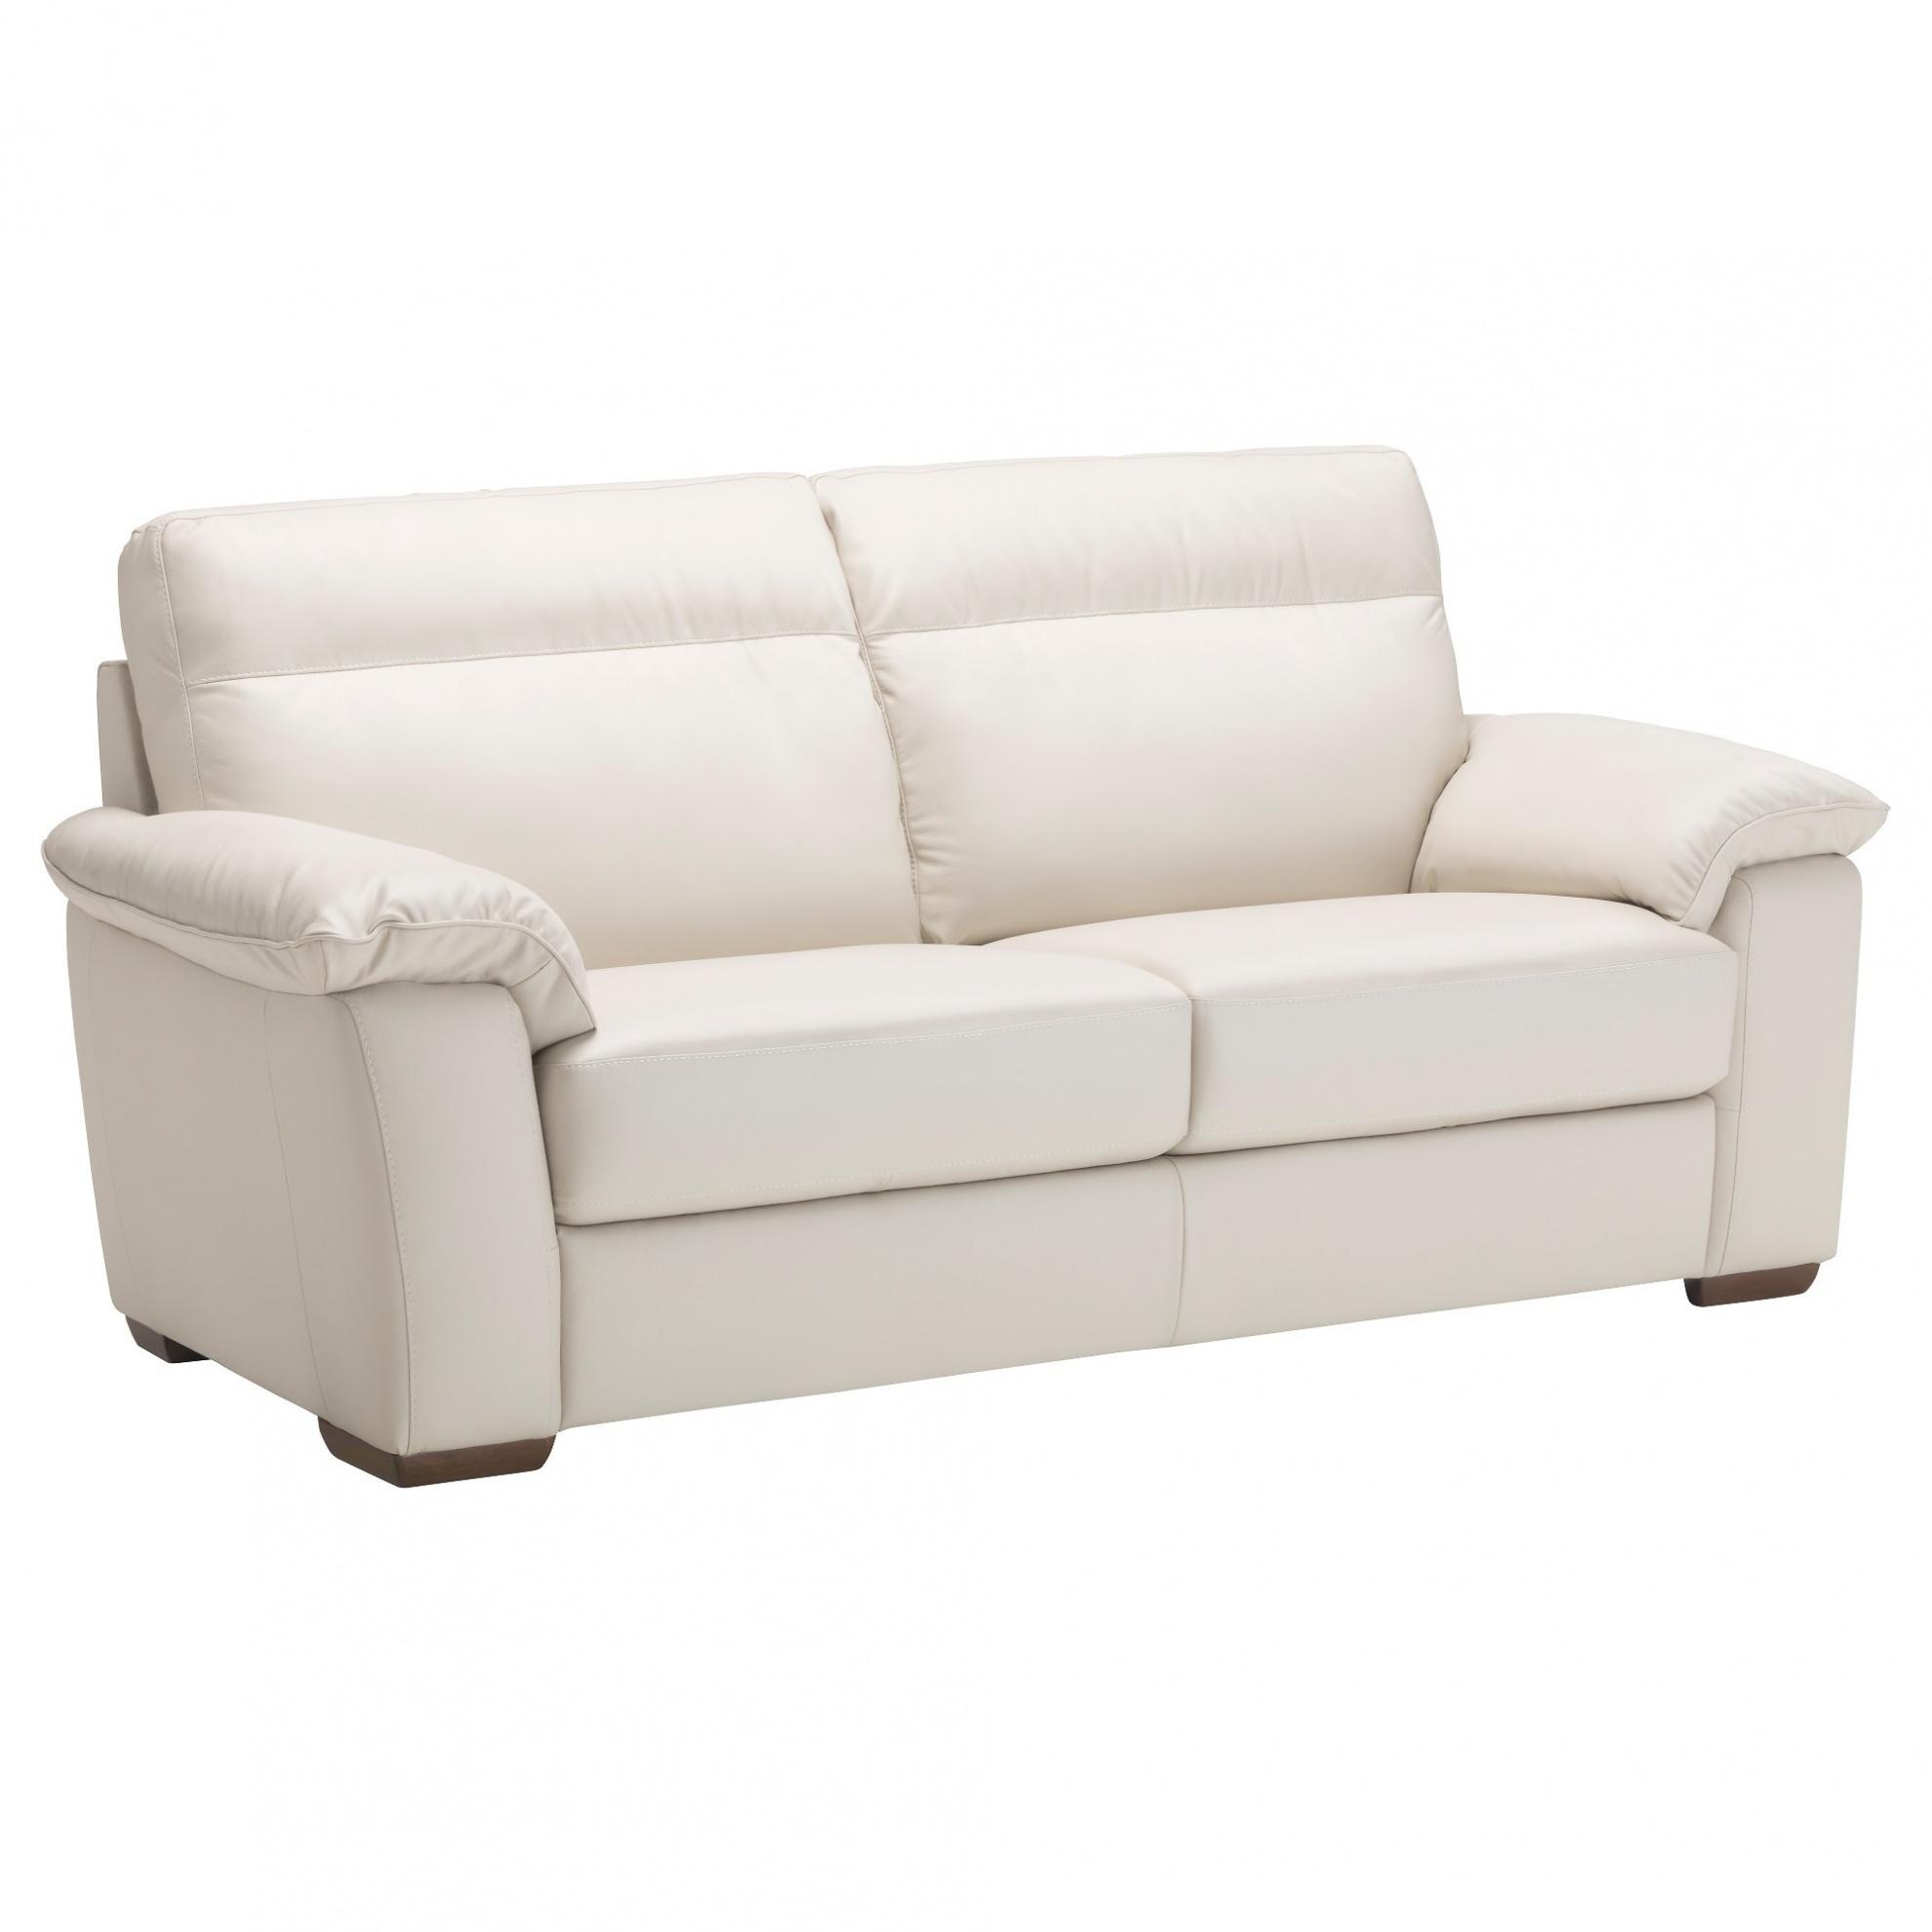 ikea canap convertible 3 places l gant photos canap. Black Bedroom Furniture Sets. Home Design Ideas